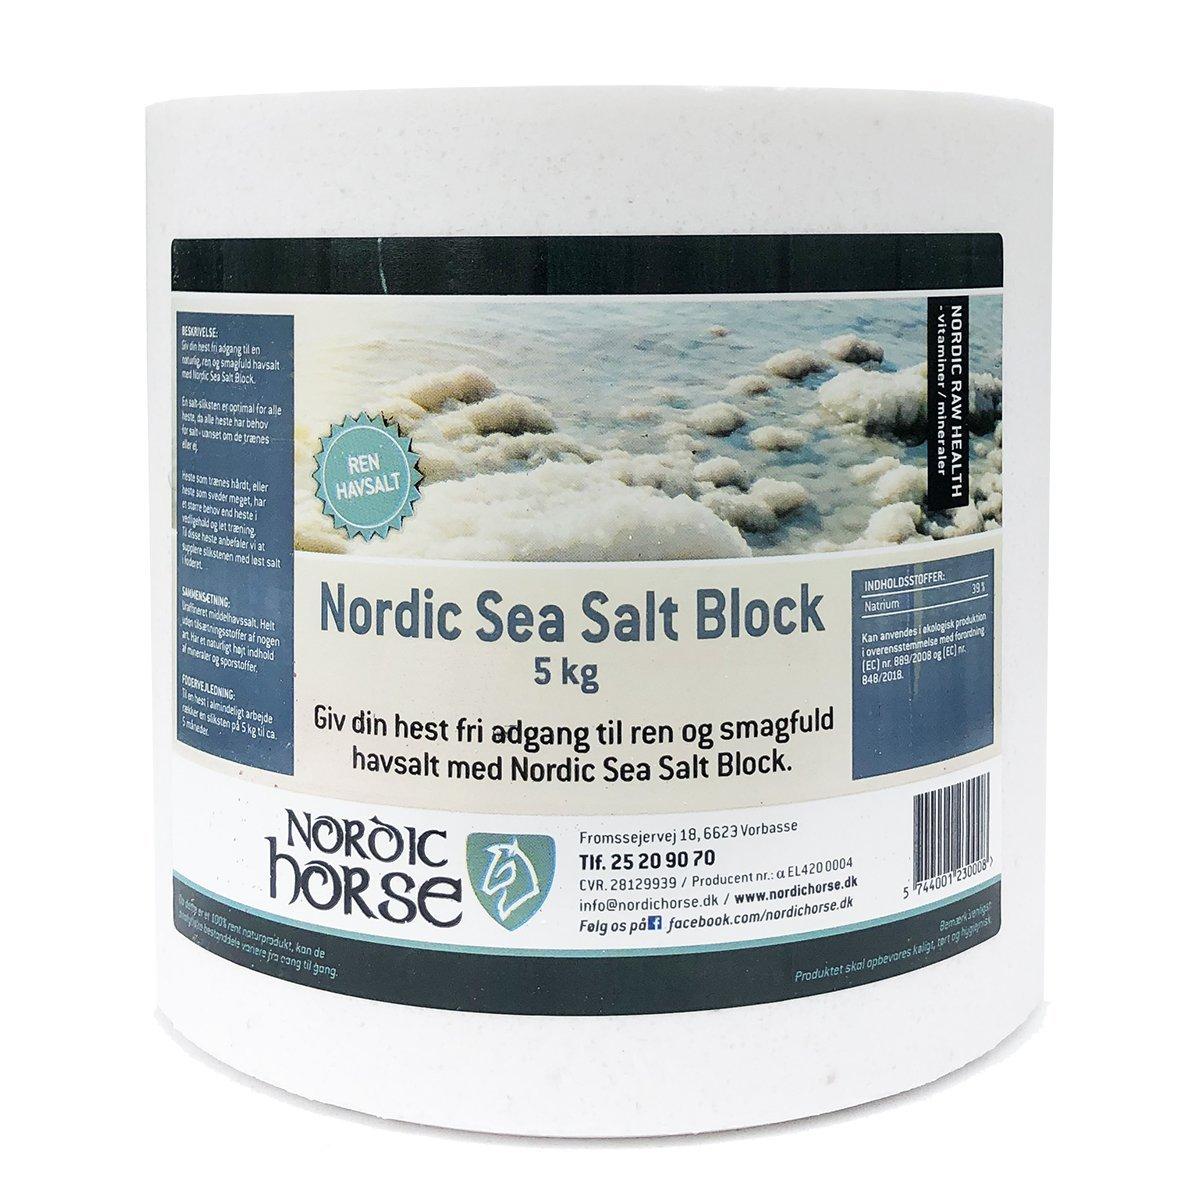 Nordic Horse Sea Salt Block - Neutral